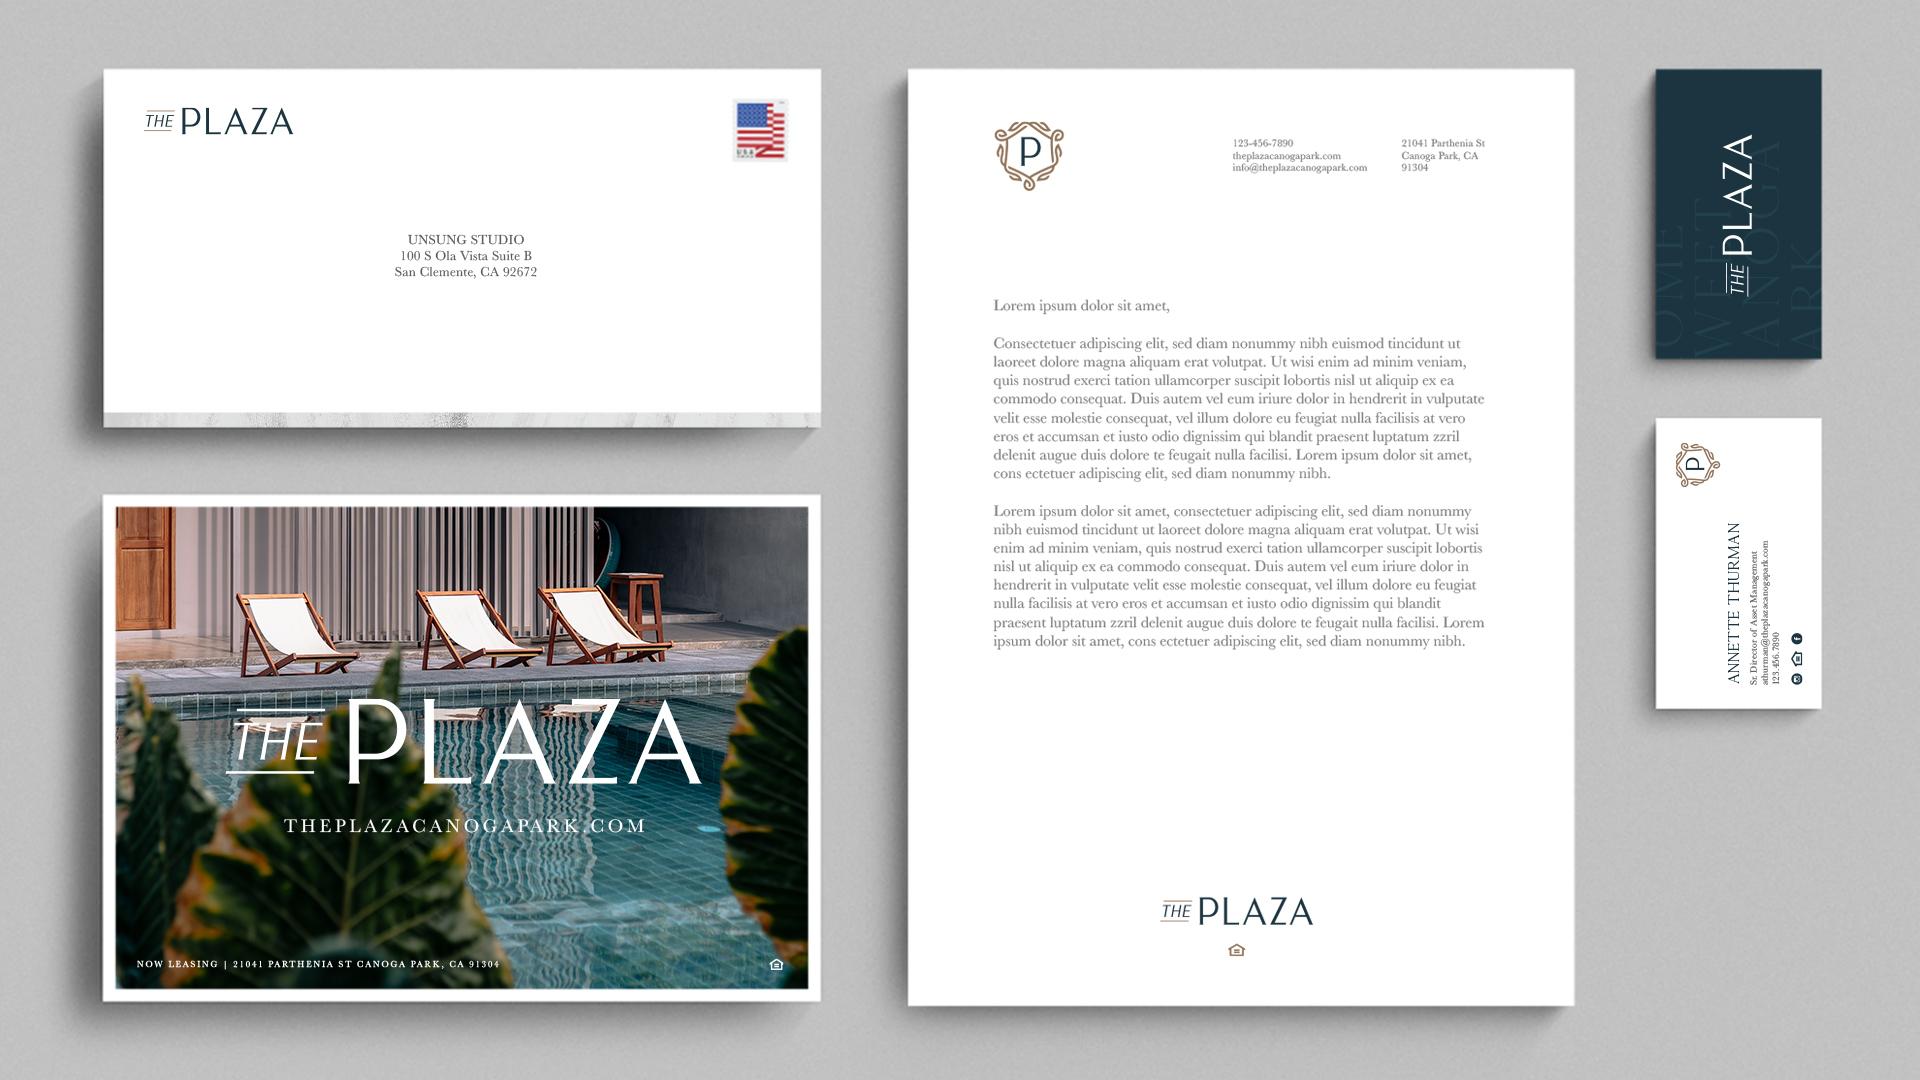 The Plaza Raintree Partners Stationery - Unsung Studio Branding